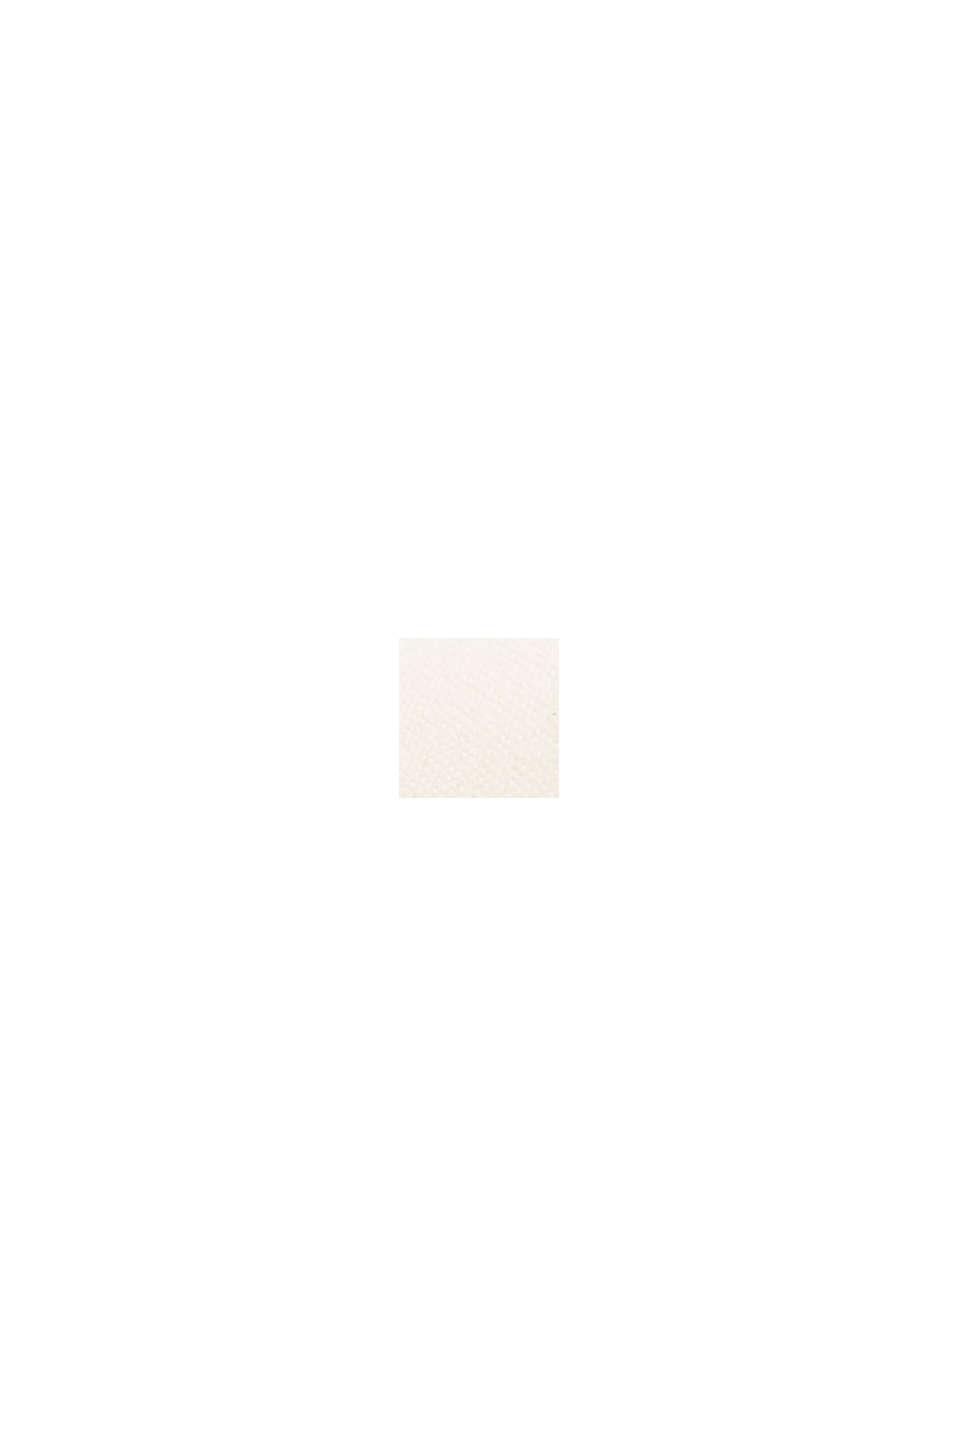 Espadriller med rem i bomull, OFF WHITE, swatch